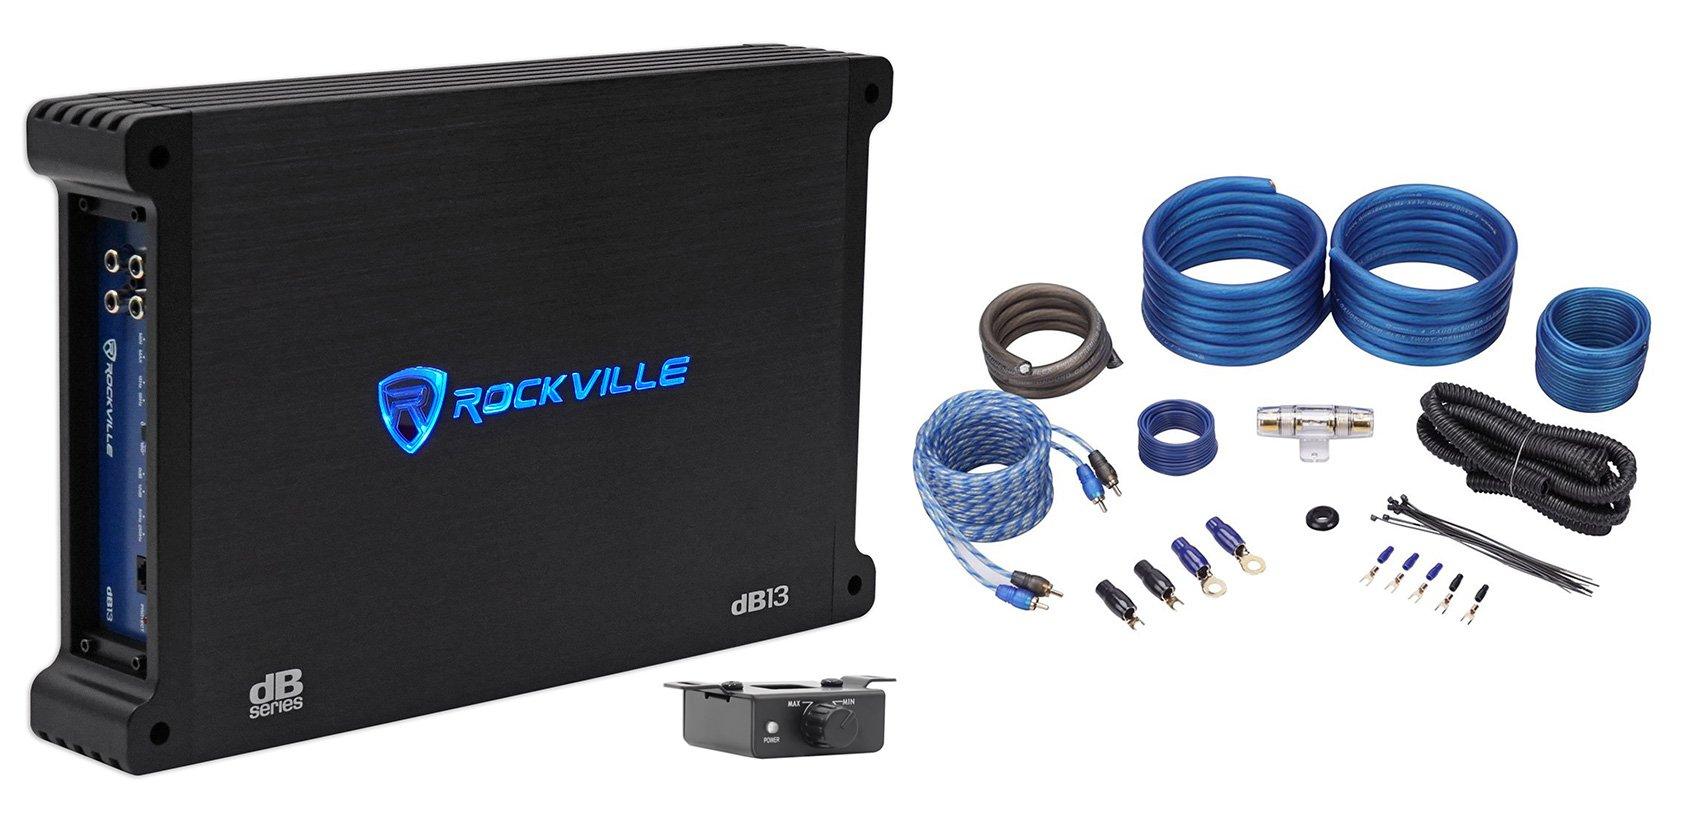 Rockville dB13 3000 Compliant Amplifier